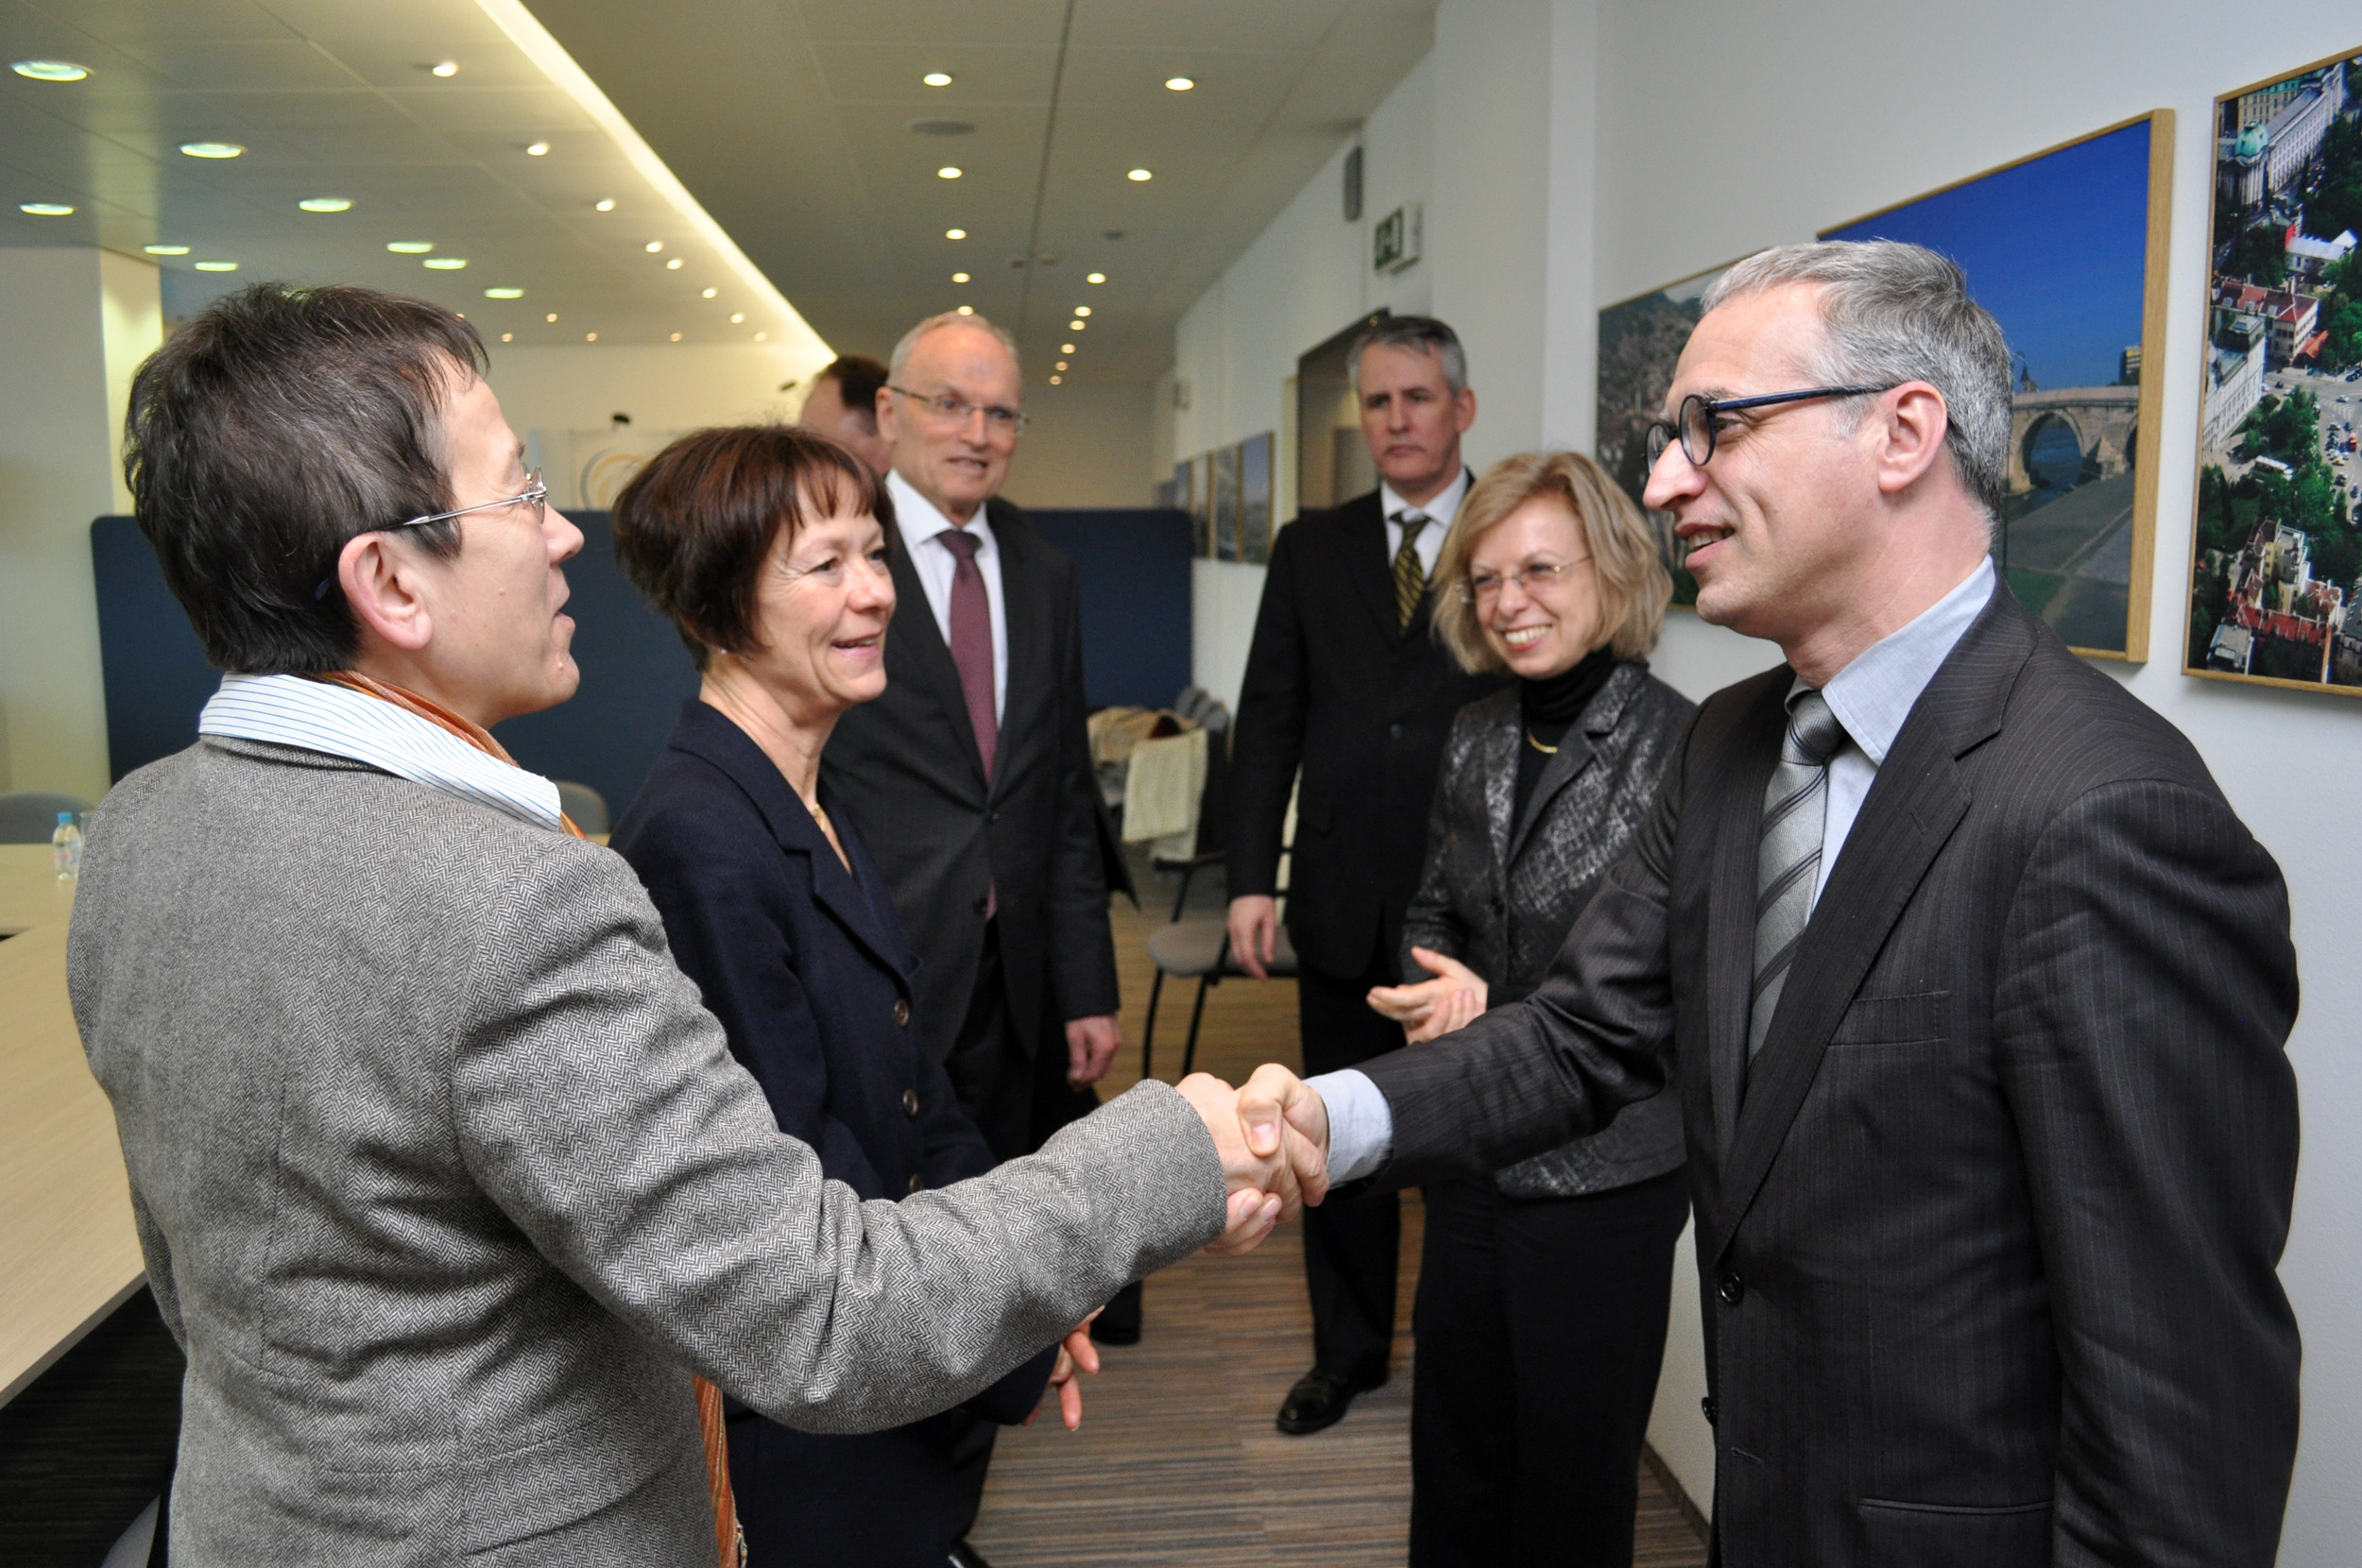 Goran Svilanovic, RCC Secretary General (right), welcomes German ambassadors from the Western Balkans region at the RCC premises, Sarajevo, 11 March 2013. (Photo: RCC/Nedim Grabovica)